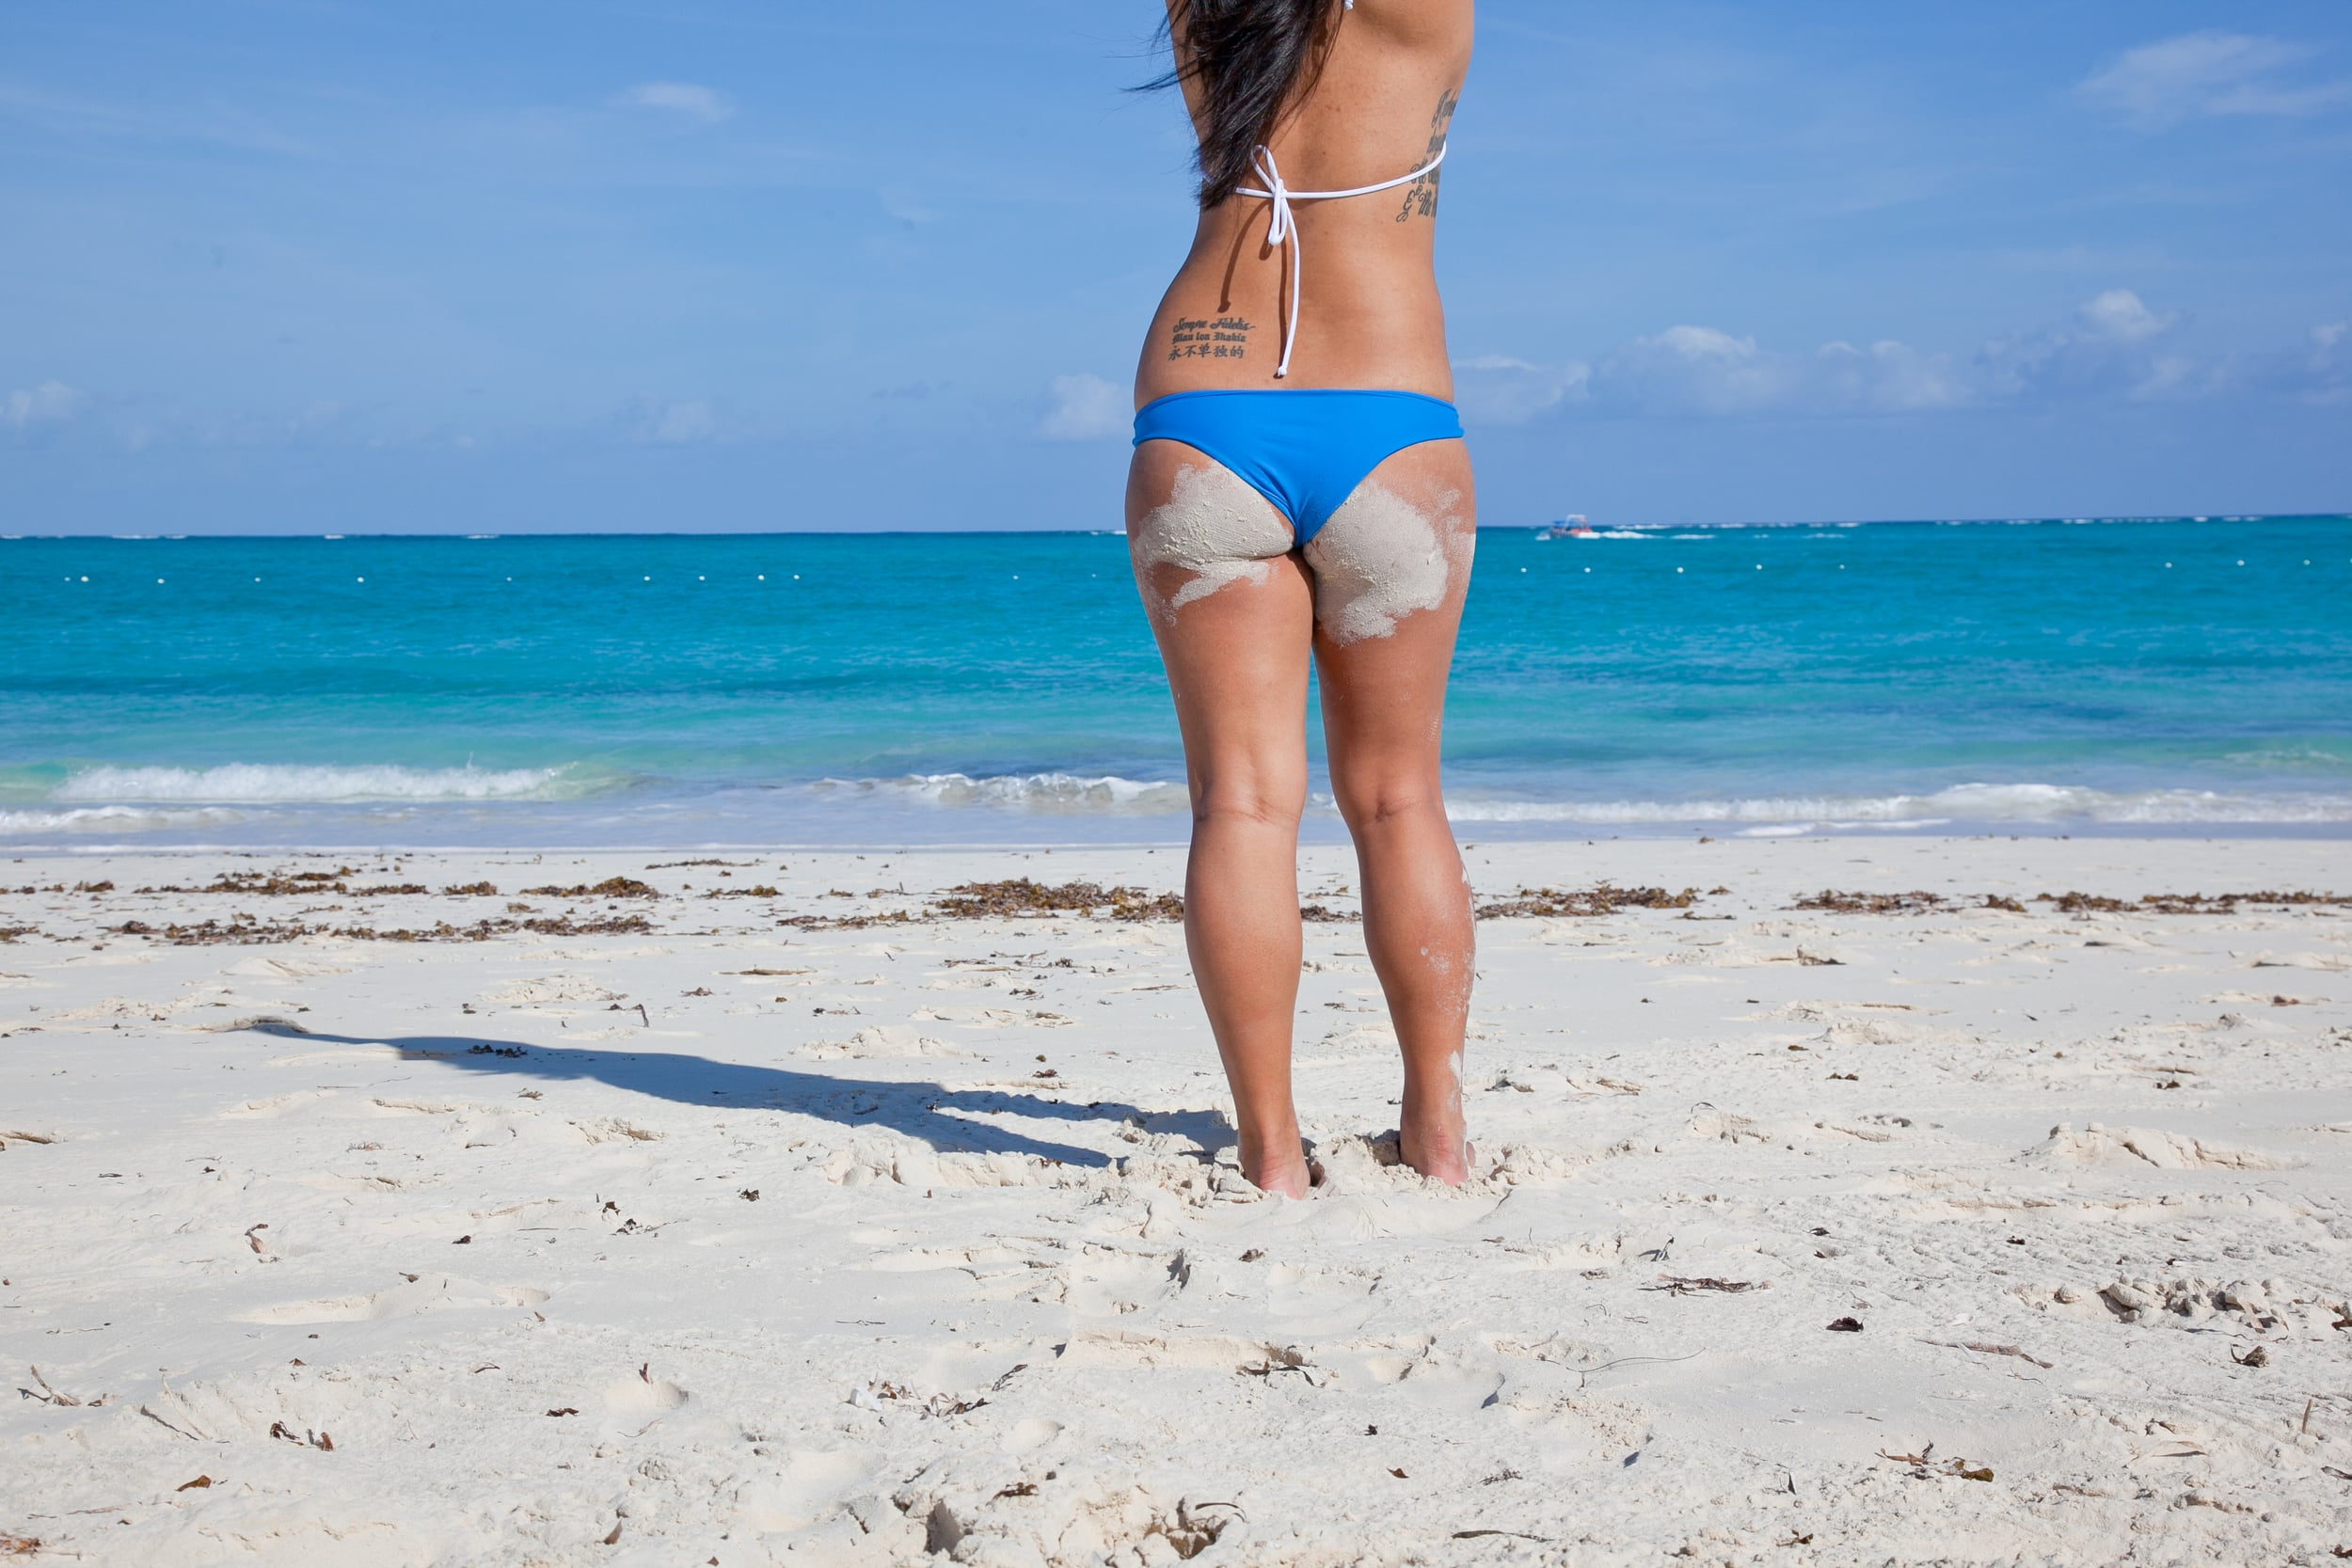 trisa-taro-beach-bum-turks and caicos.jpg